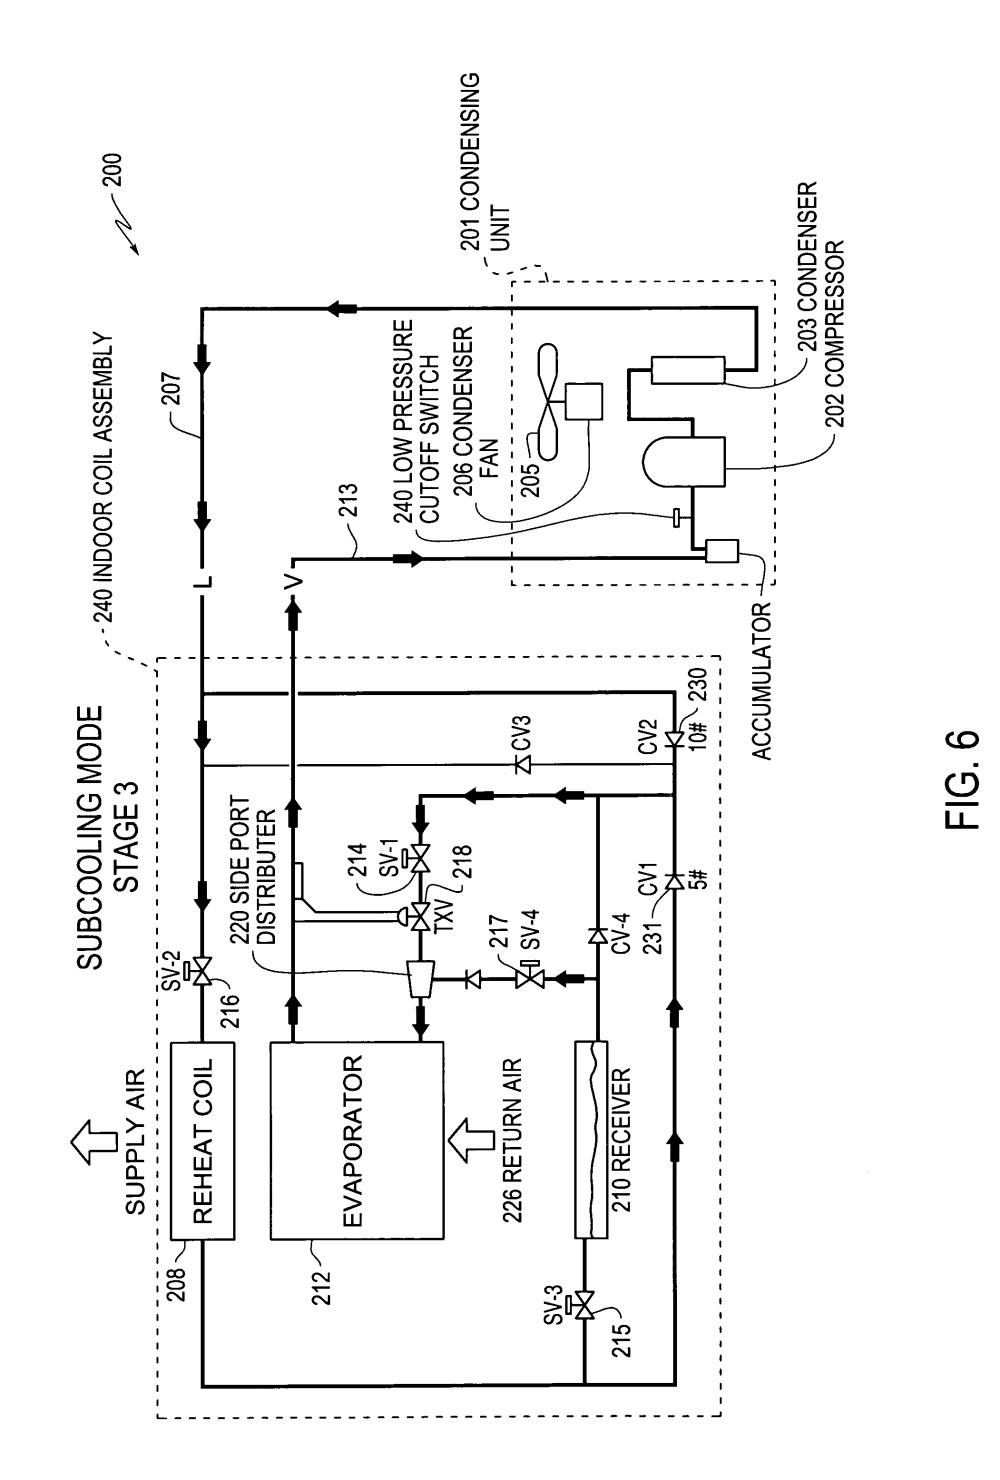 medium resolution of lennox signaturestat wiring diagram wiring diagrams lennox signaturestat wiring diagram car